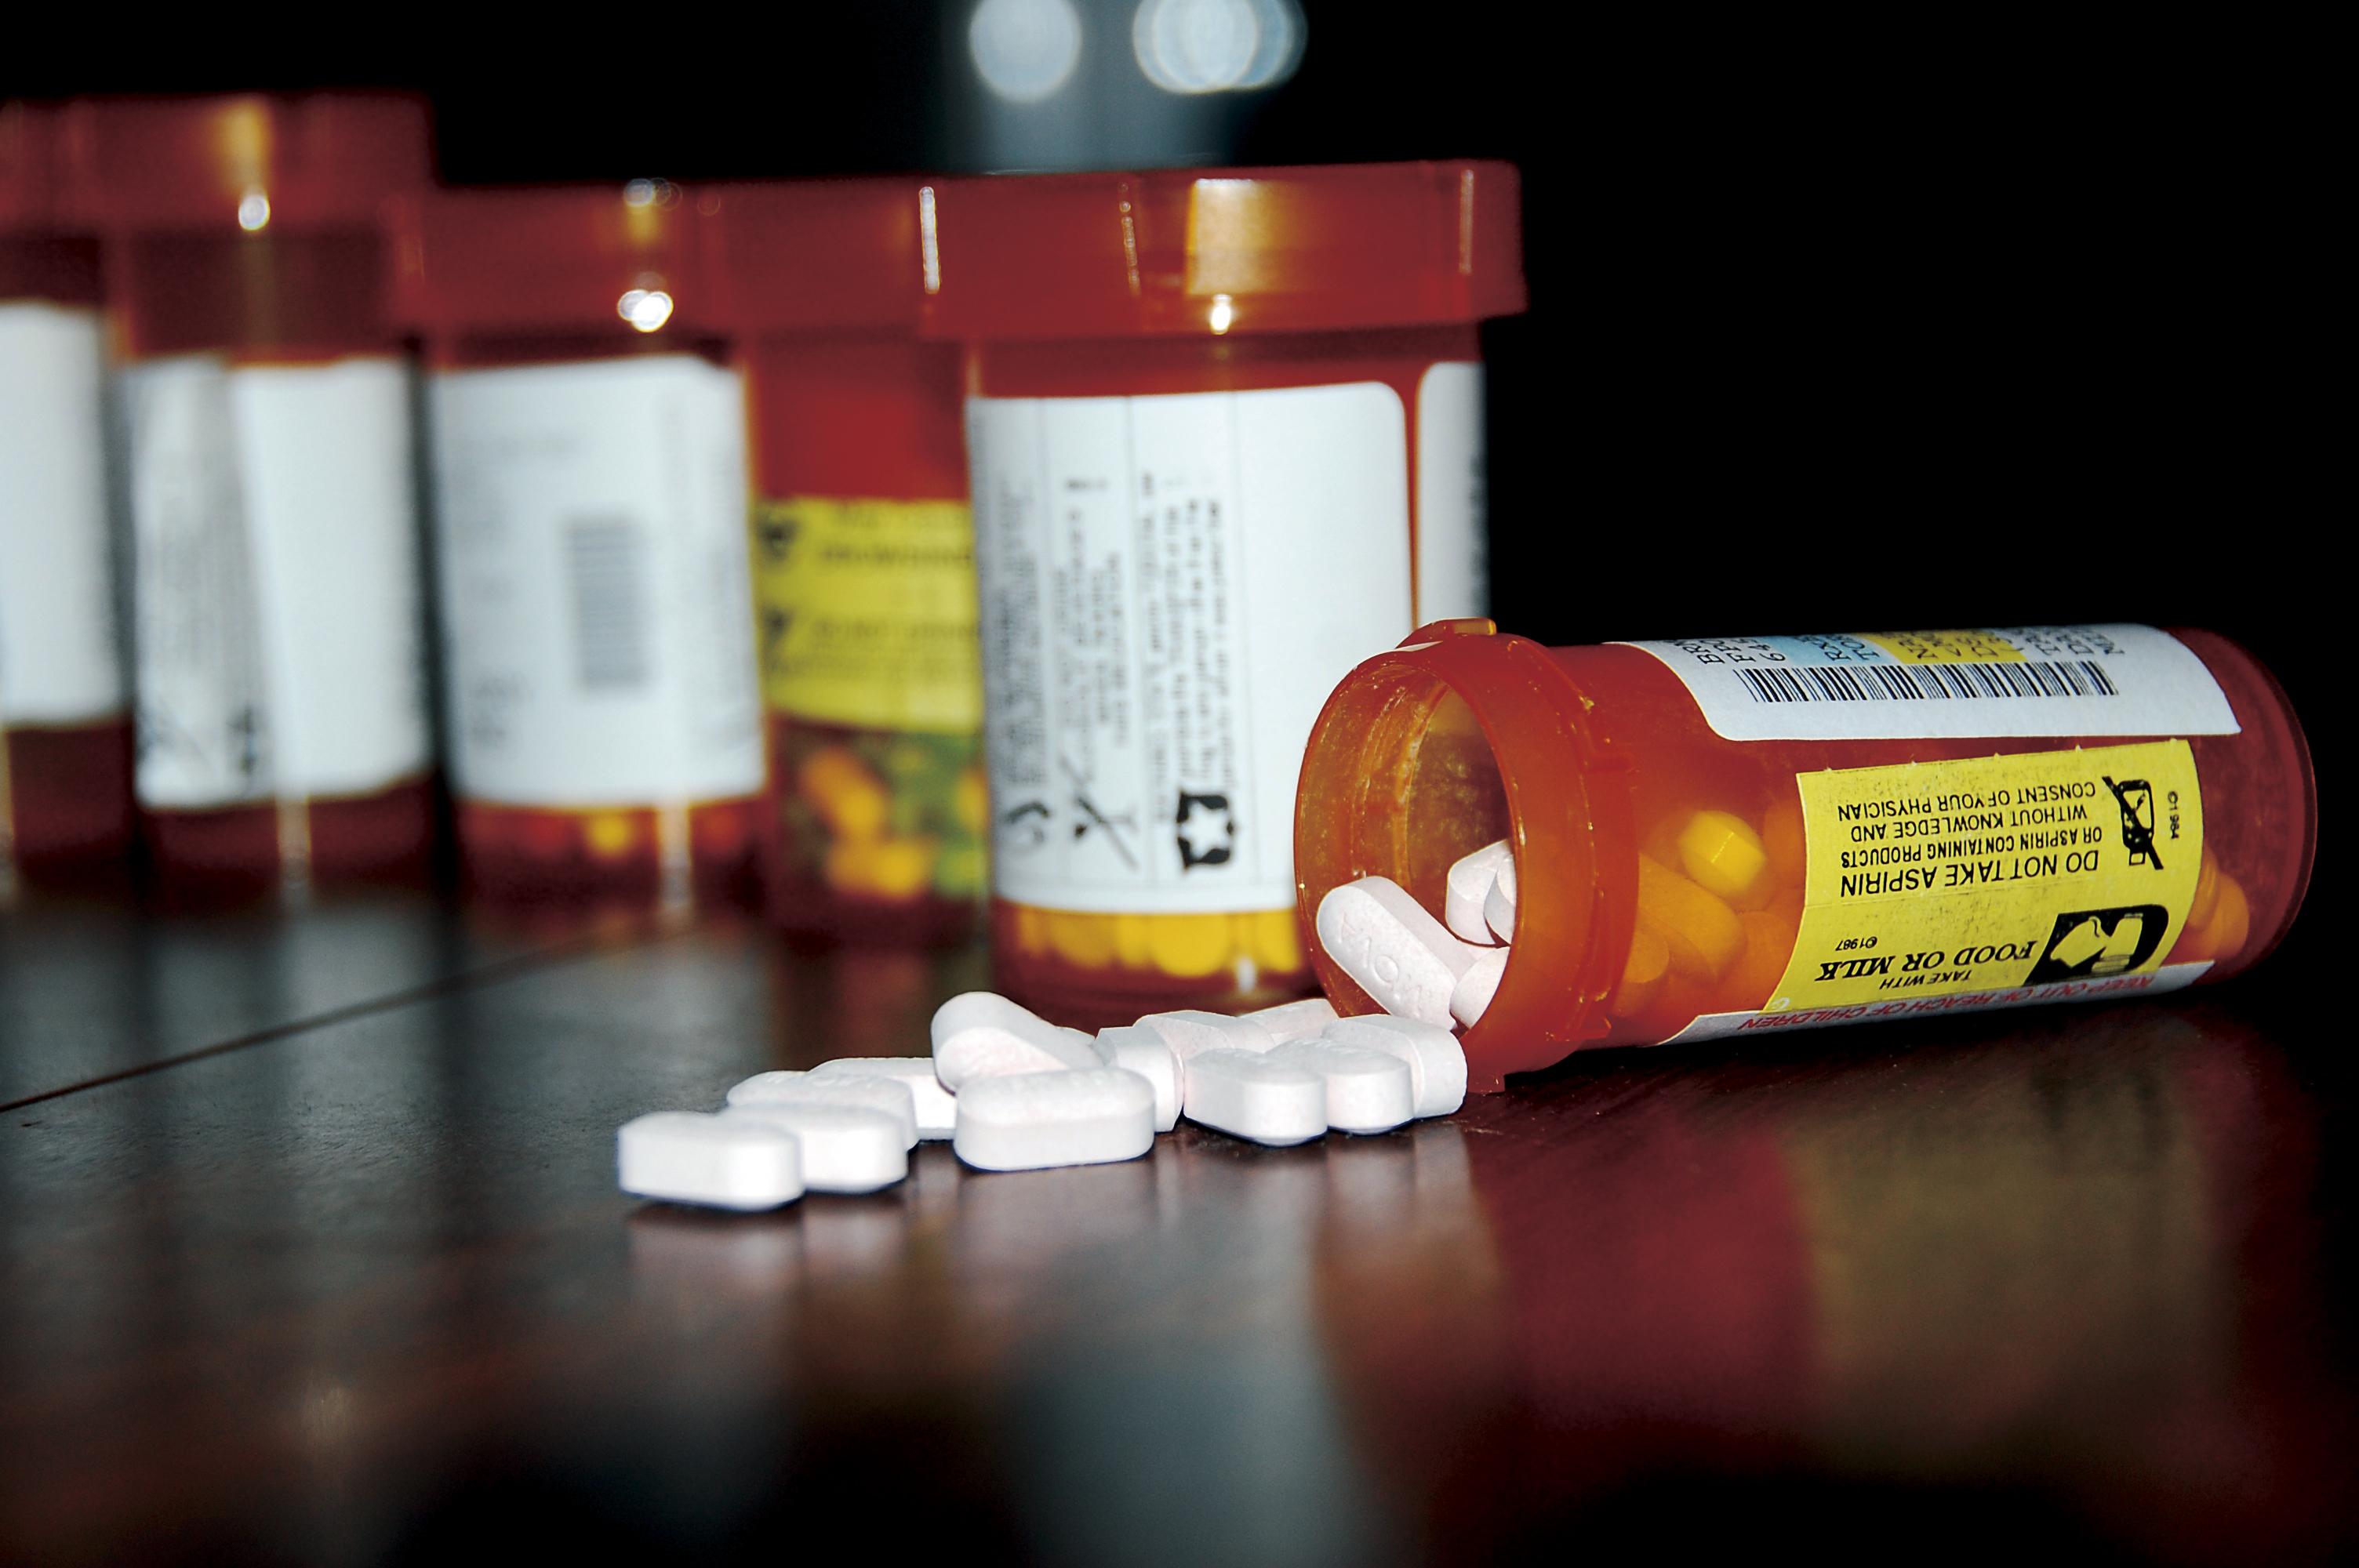 Doctor sanctioned for overprescribing Adderall after patient dies at 37 - VTDigger